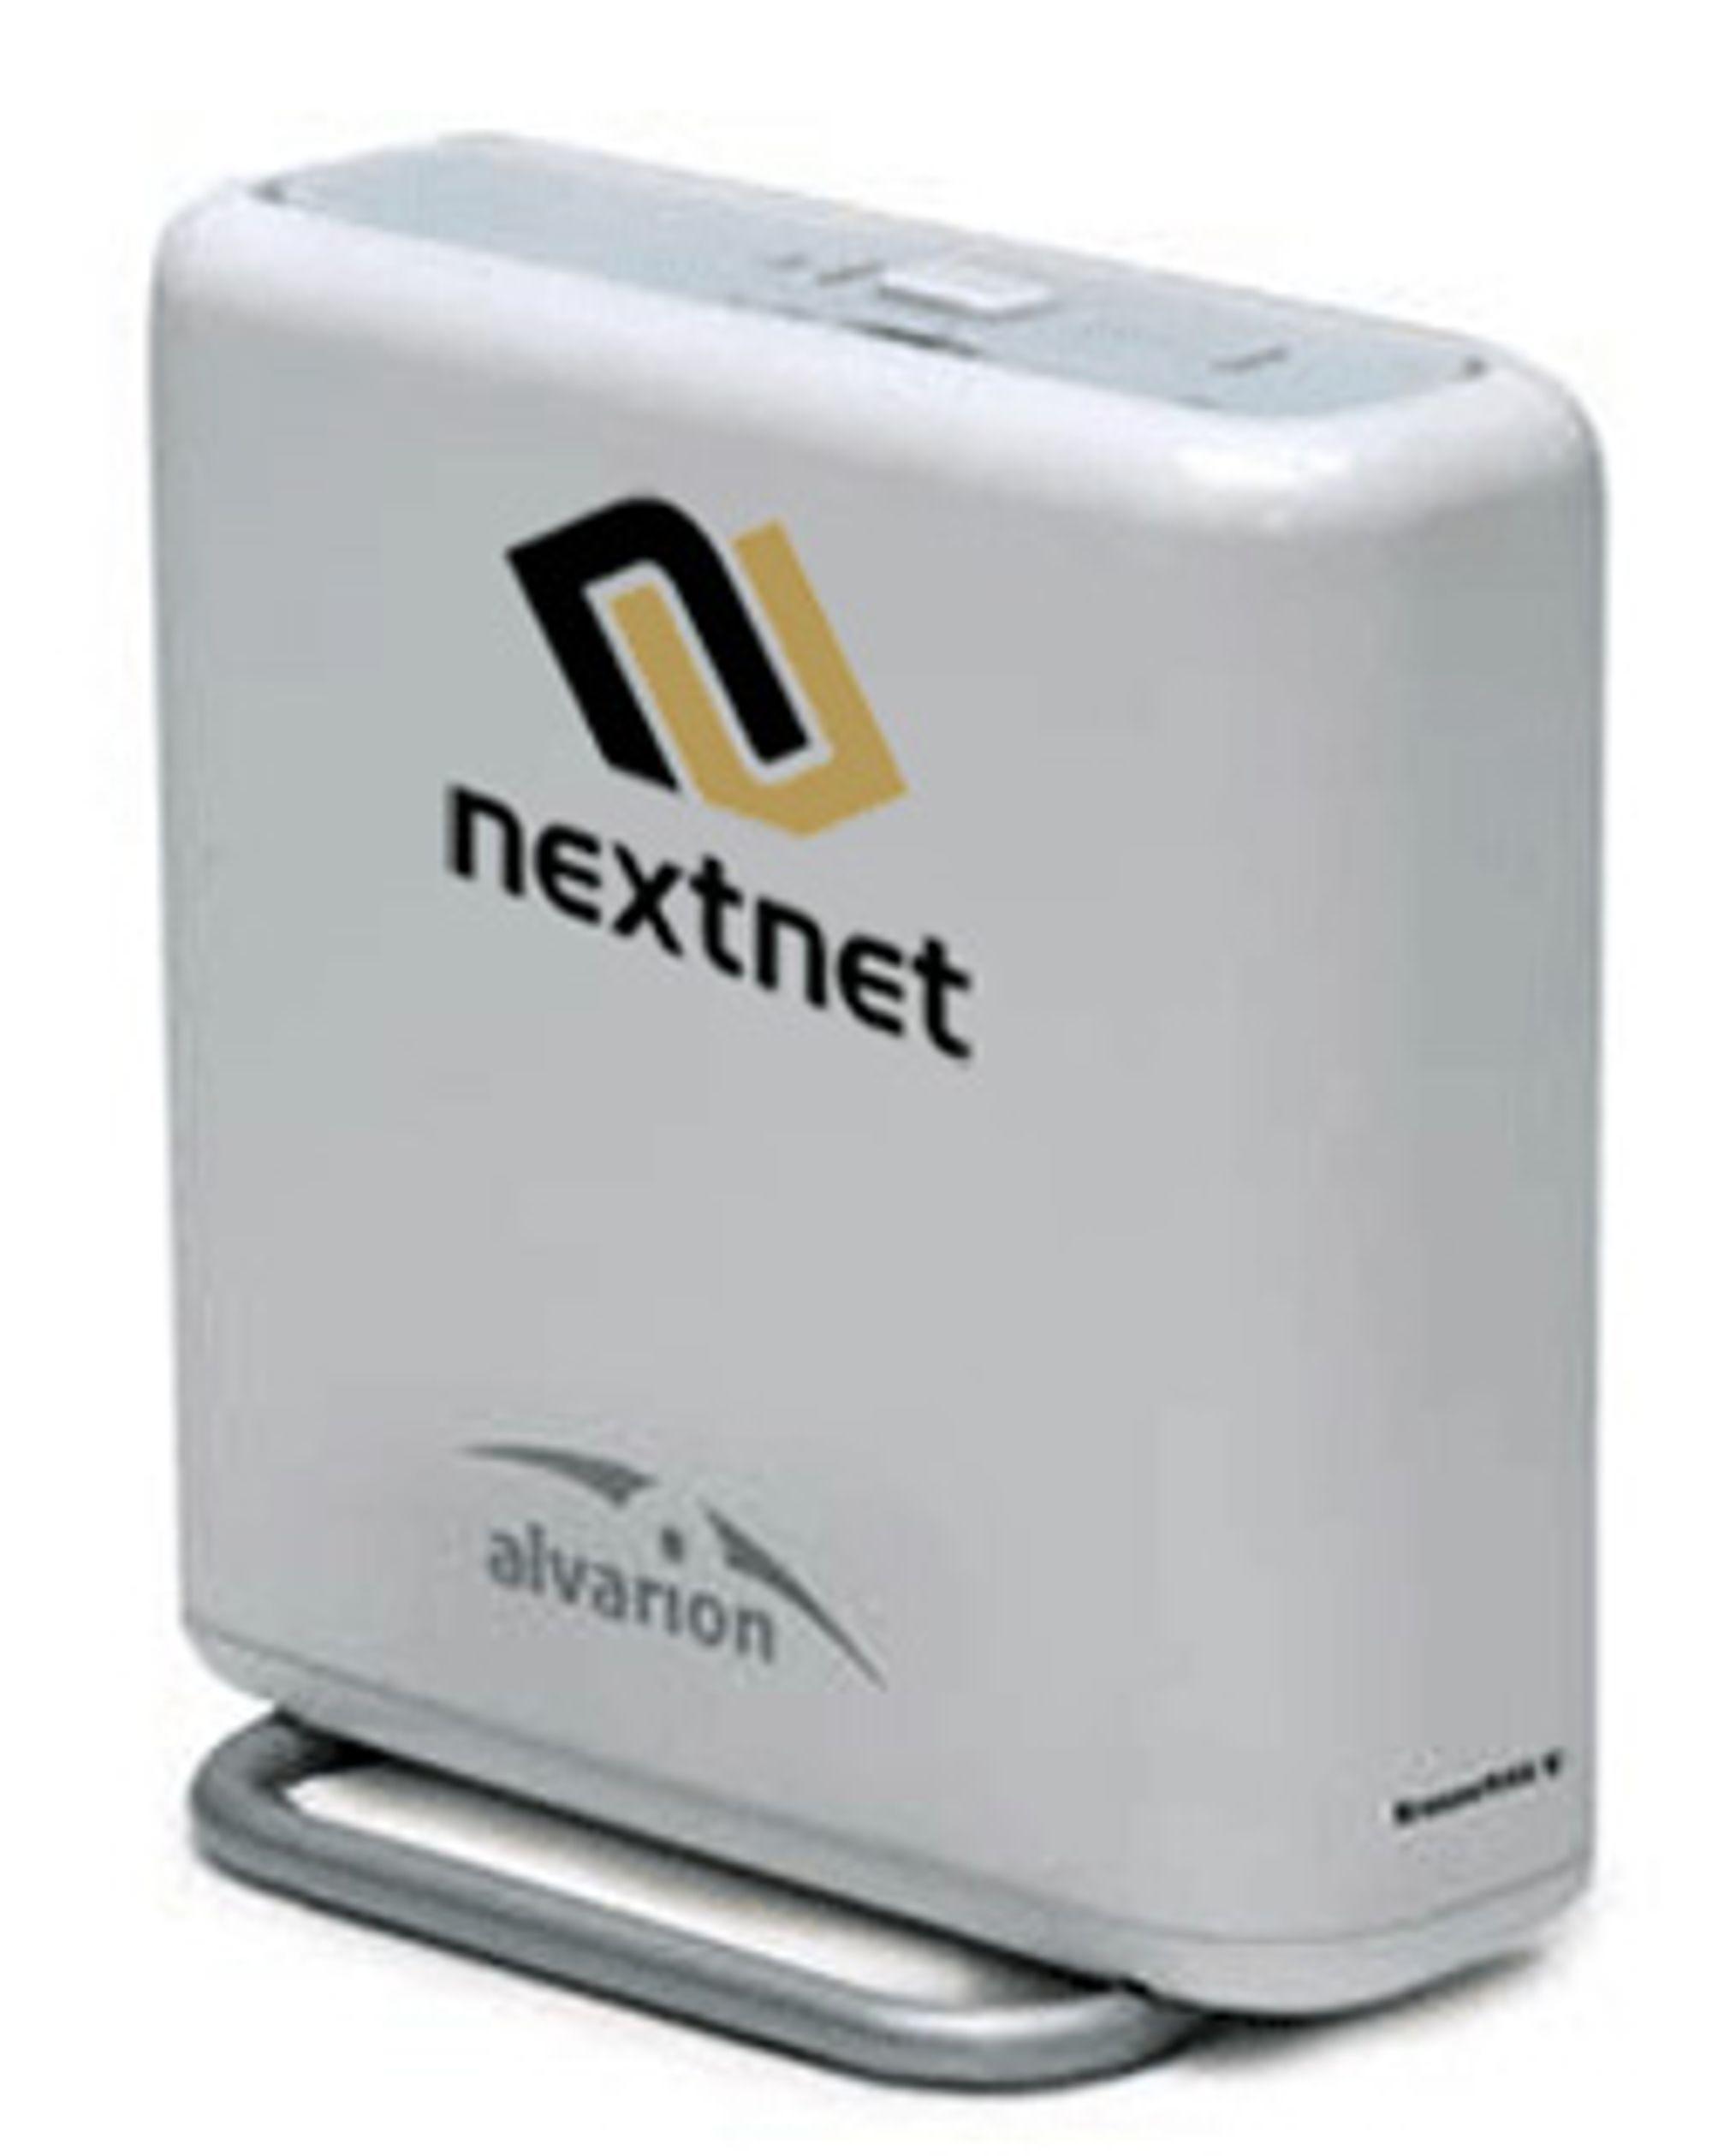 Nextnets mobile Wimax-mottaker. (Foto: Nextnet)